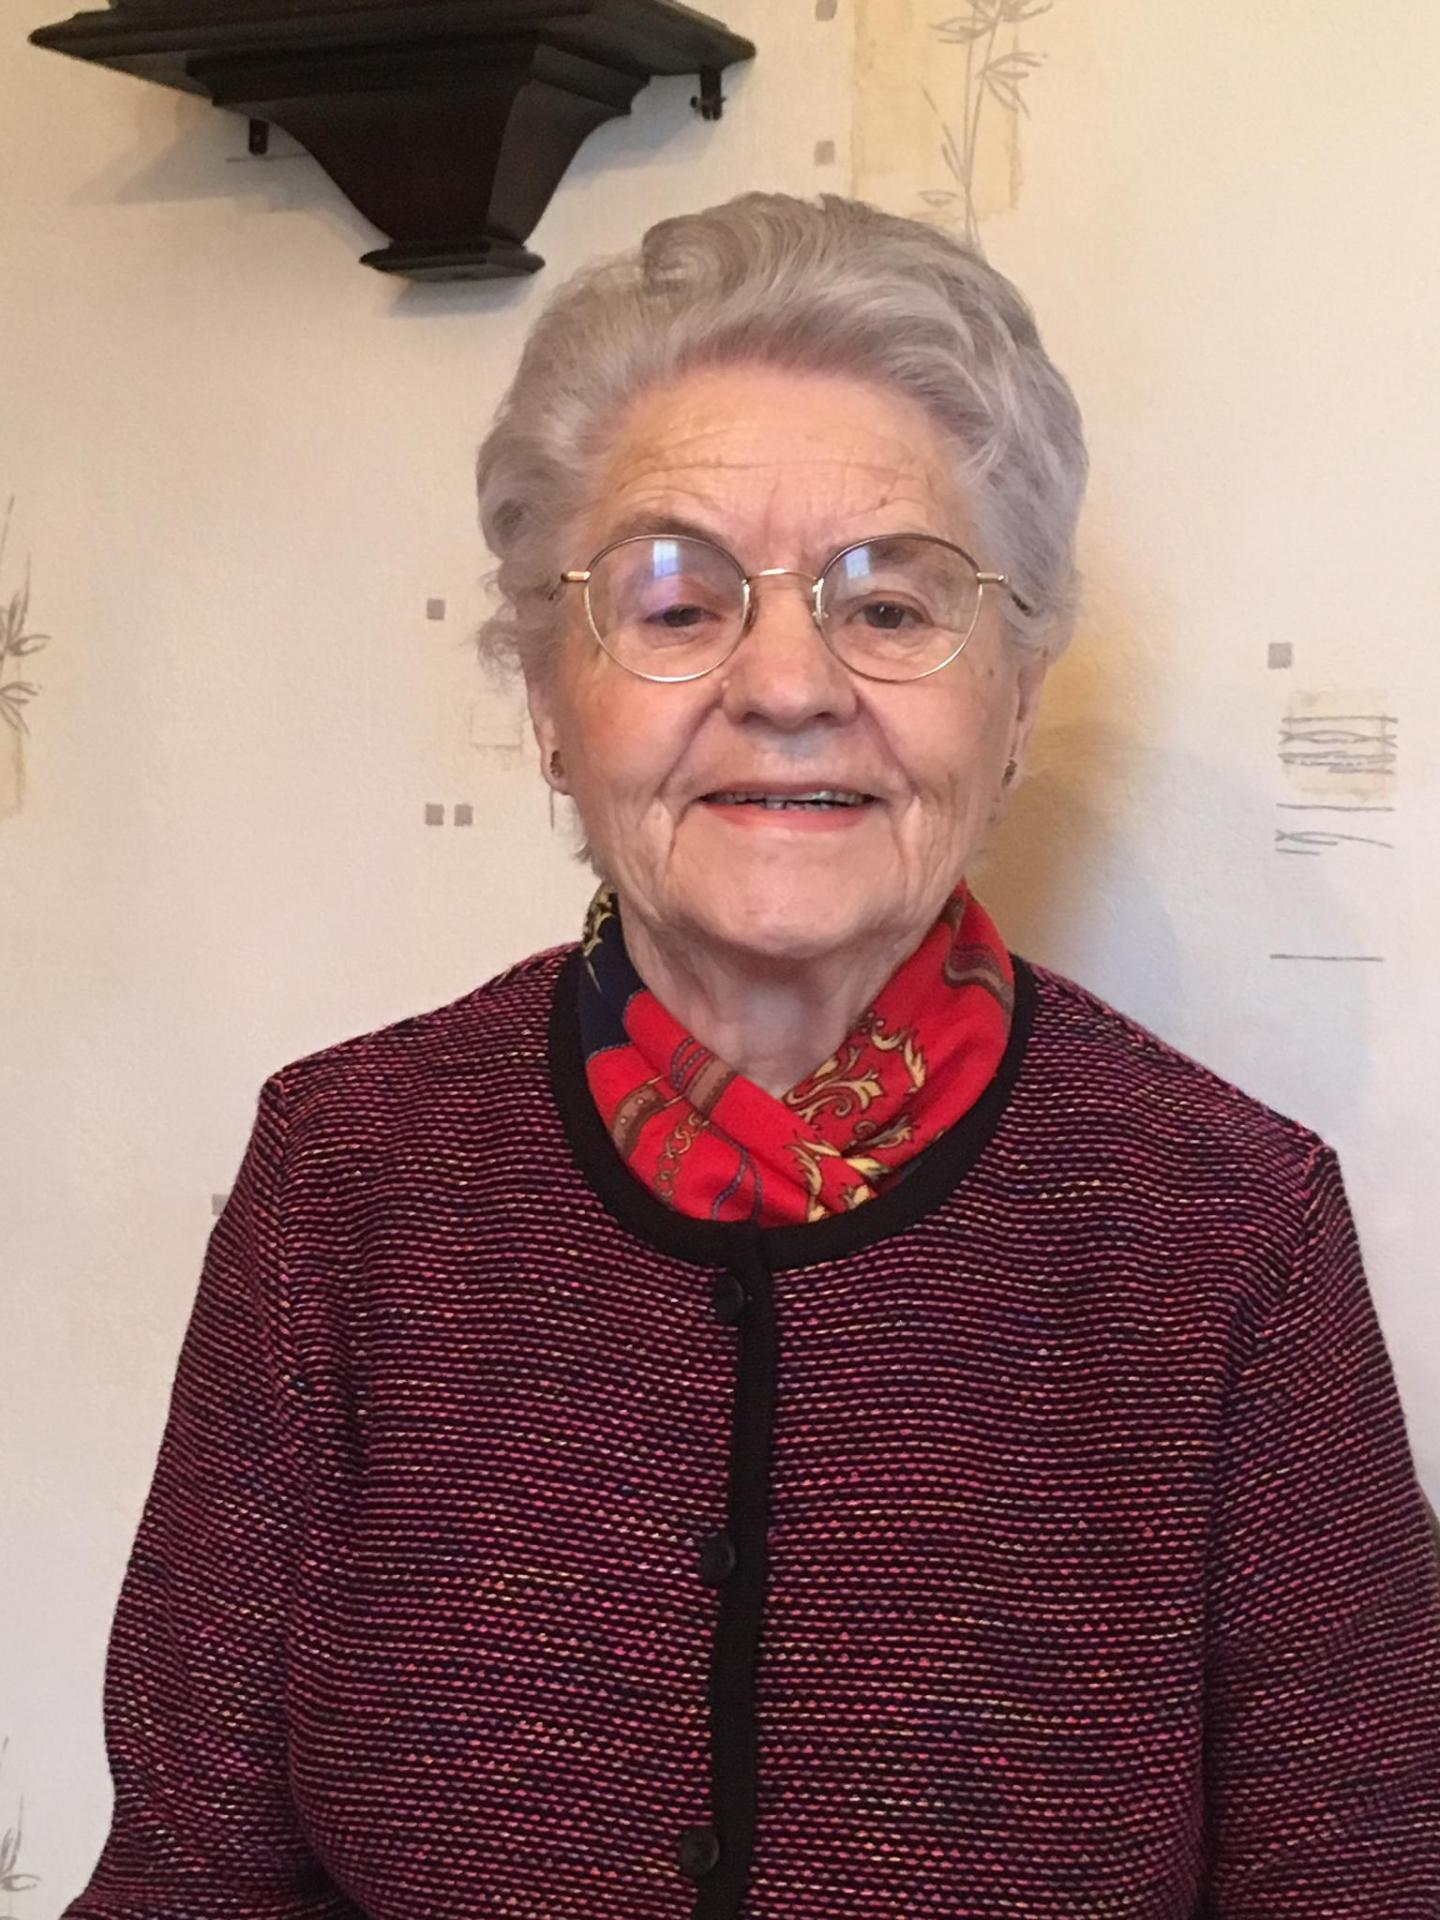 17 février:85 ans Mme Marguerite Macker